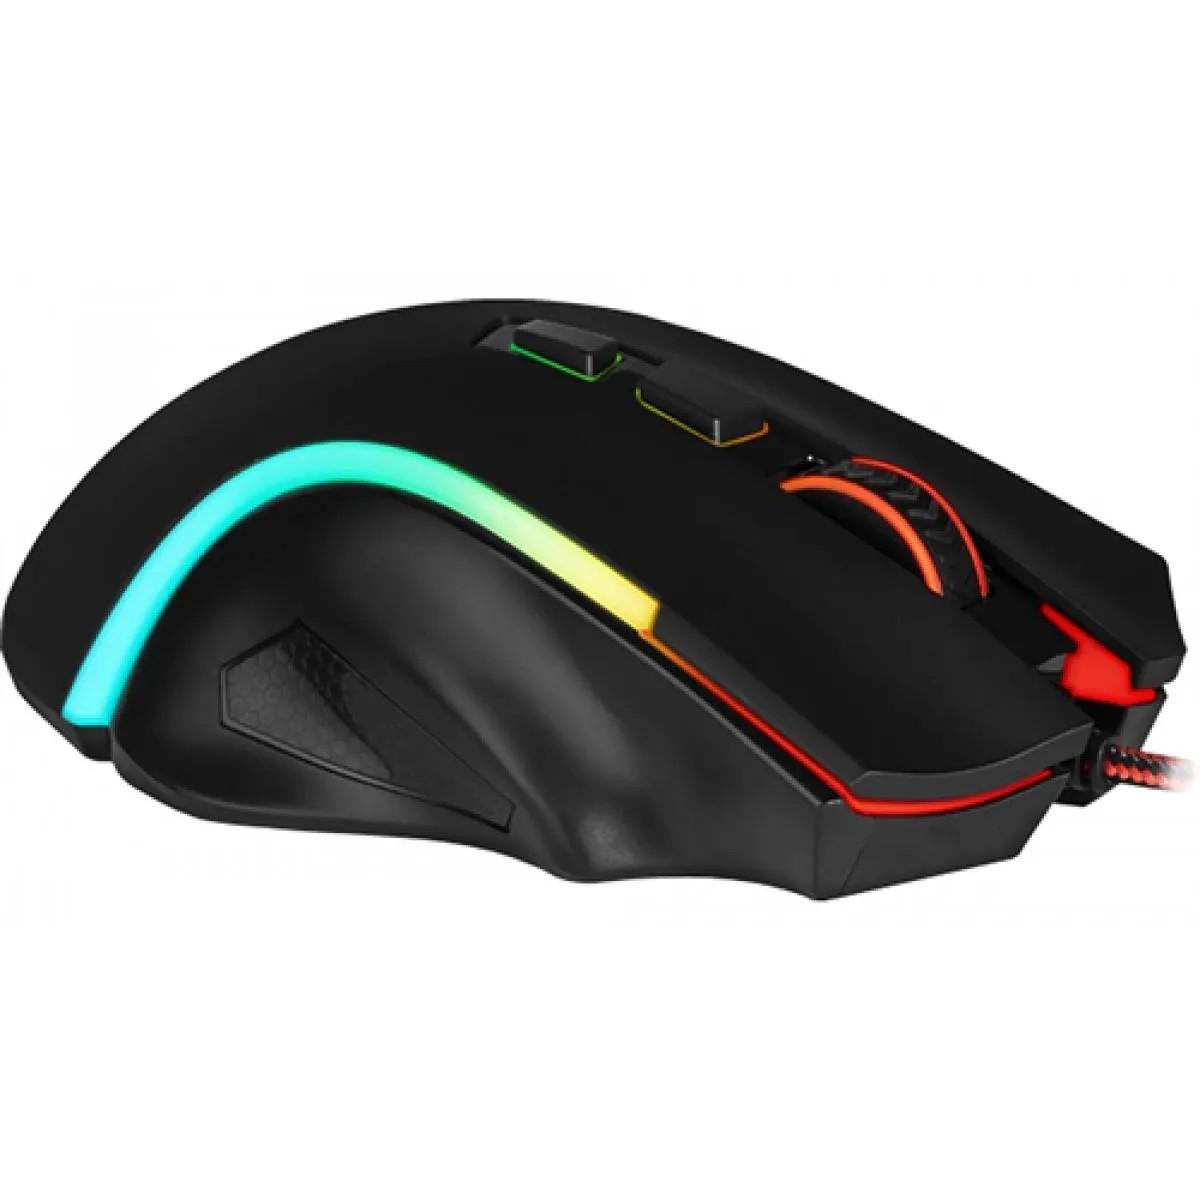 Mouse Gamer 7200dpi Rgb Redragon Griffin Rgb M607w Preto